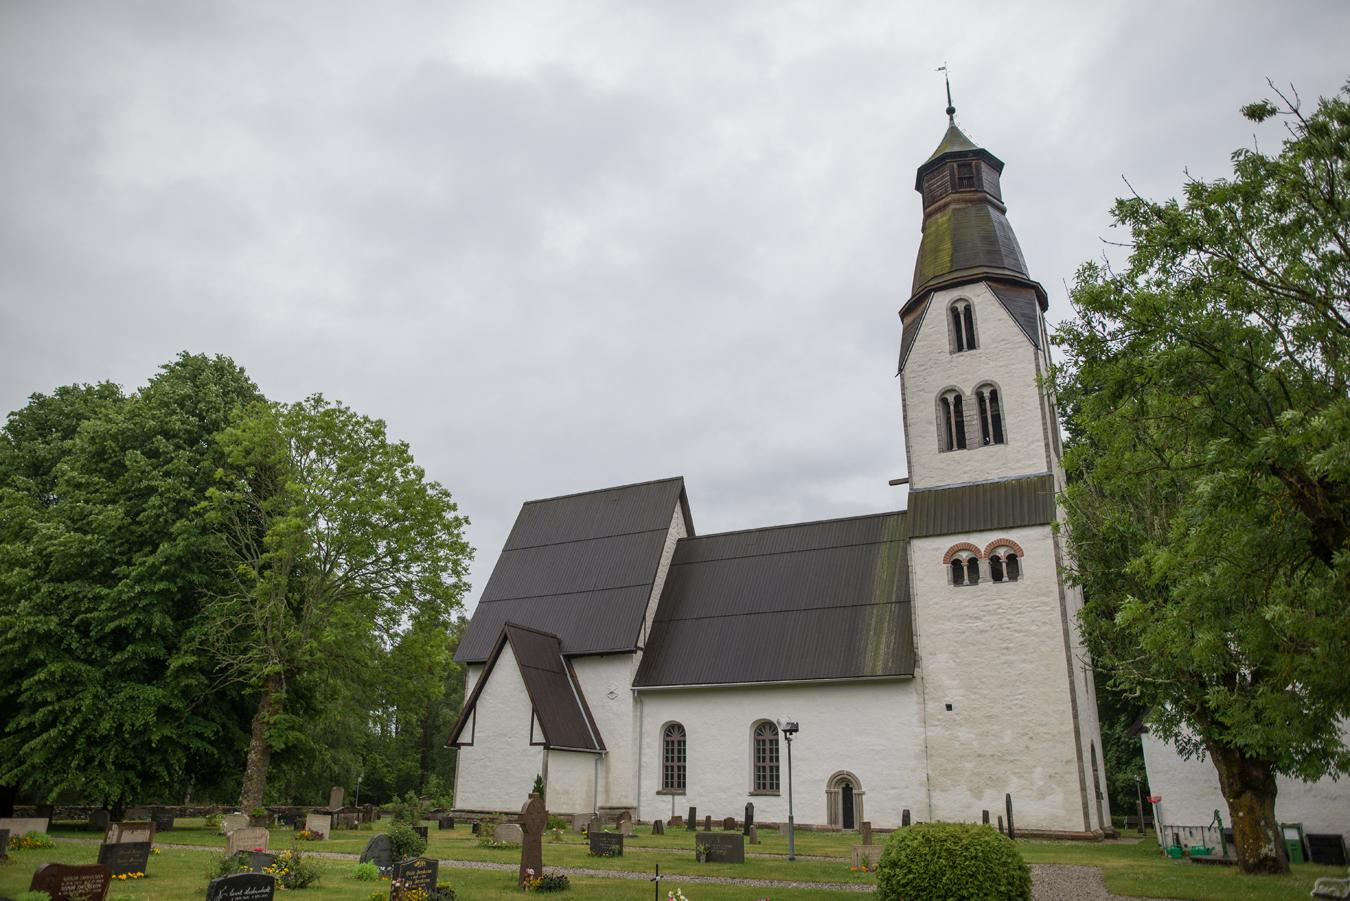 006-bröllopsfotograf-folhammar-gotland-neas-fotografi.jpg